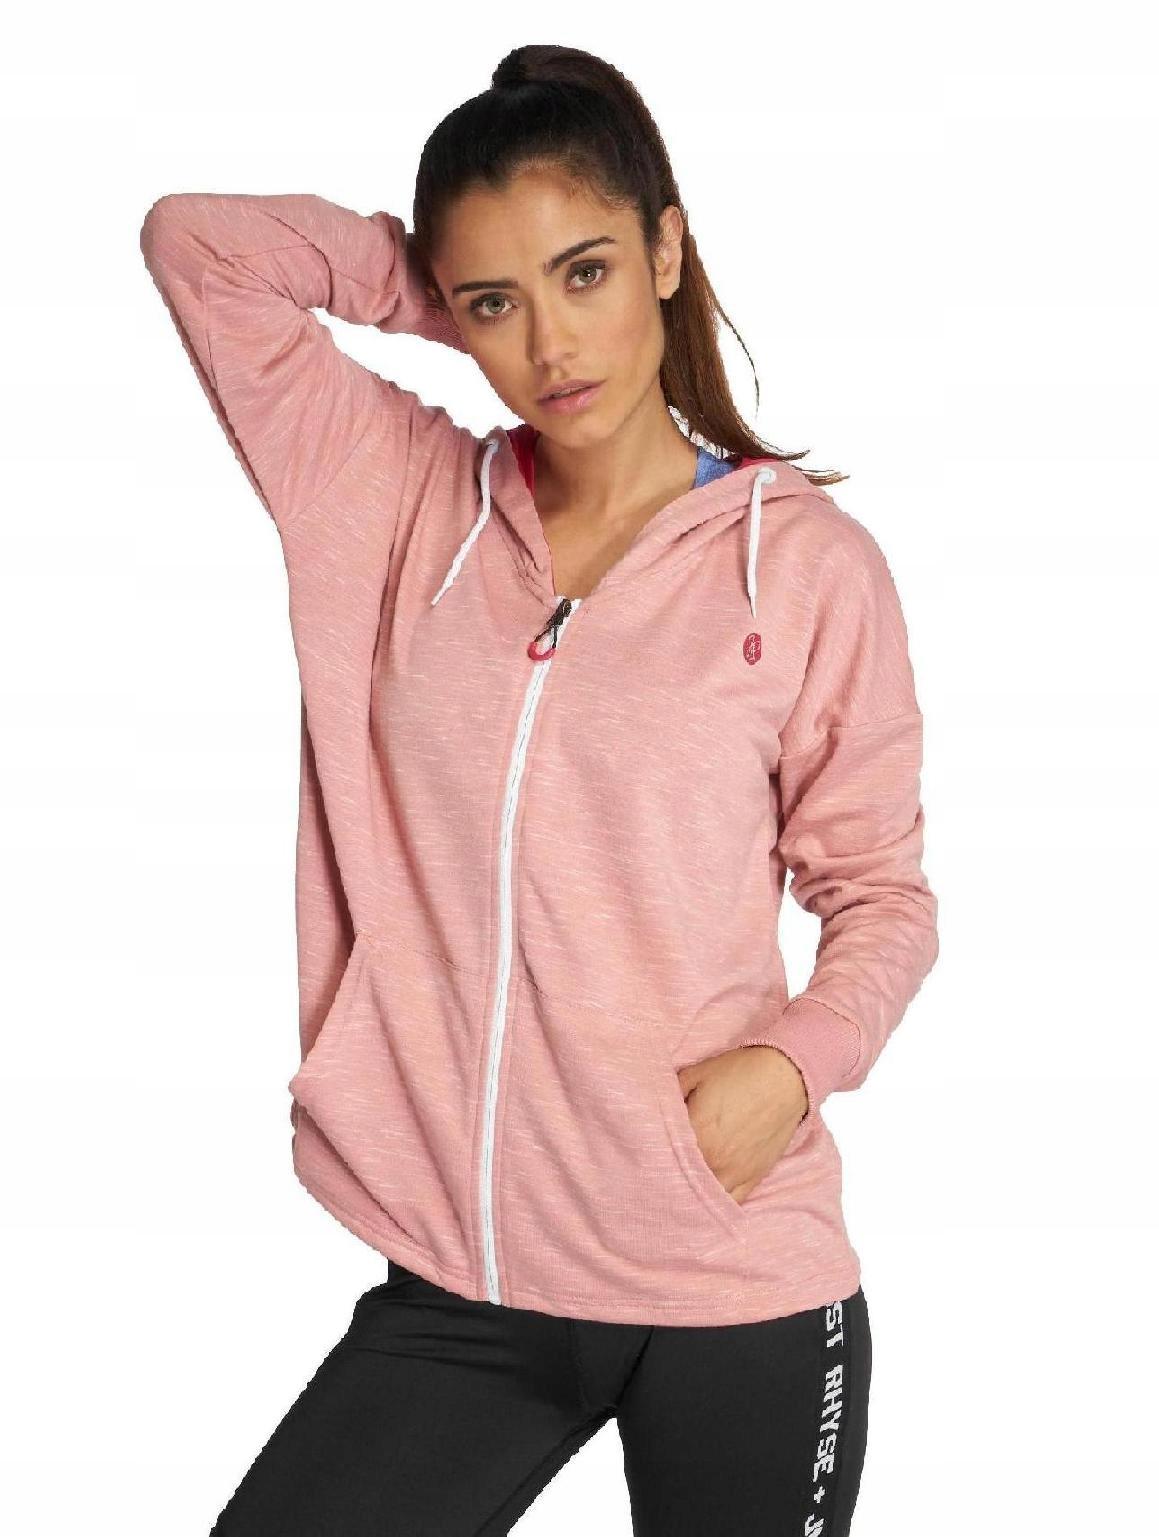 Bluza Zip Just Rhyse Akatore Active różowa L